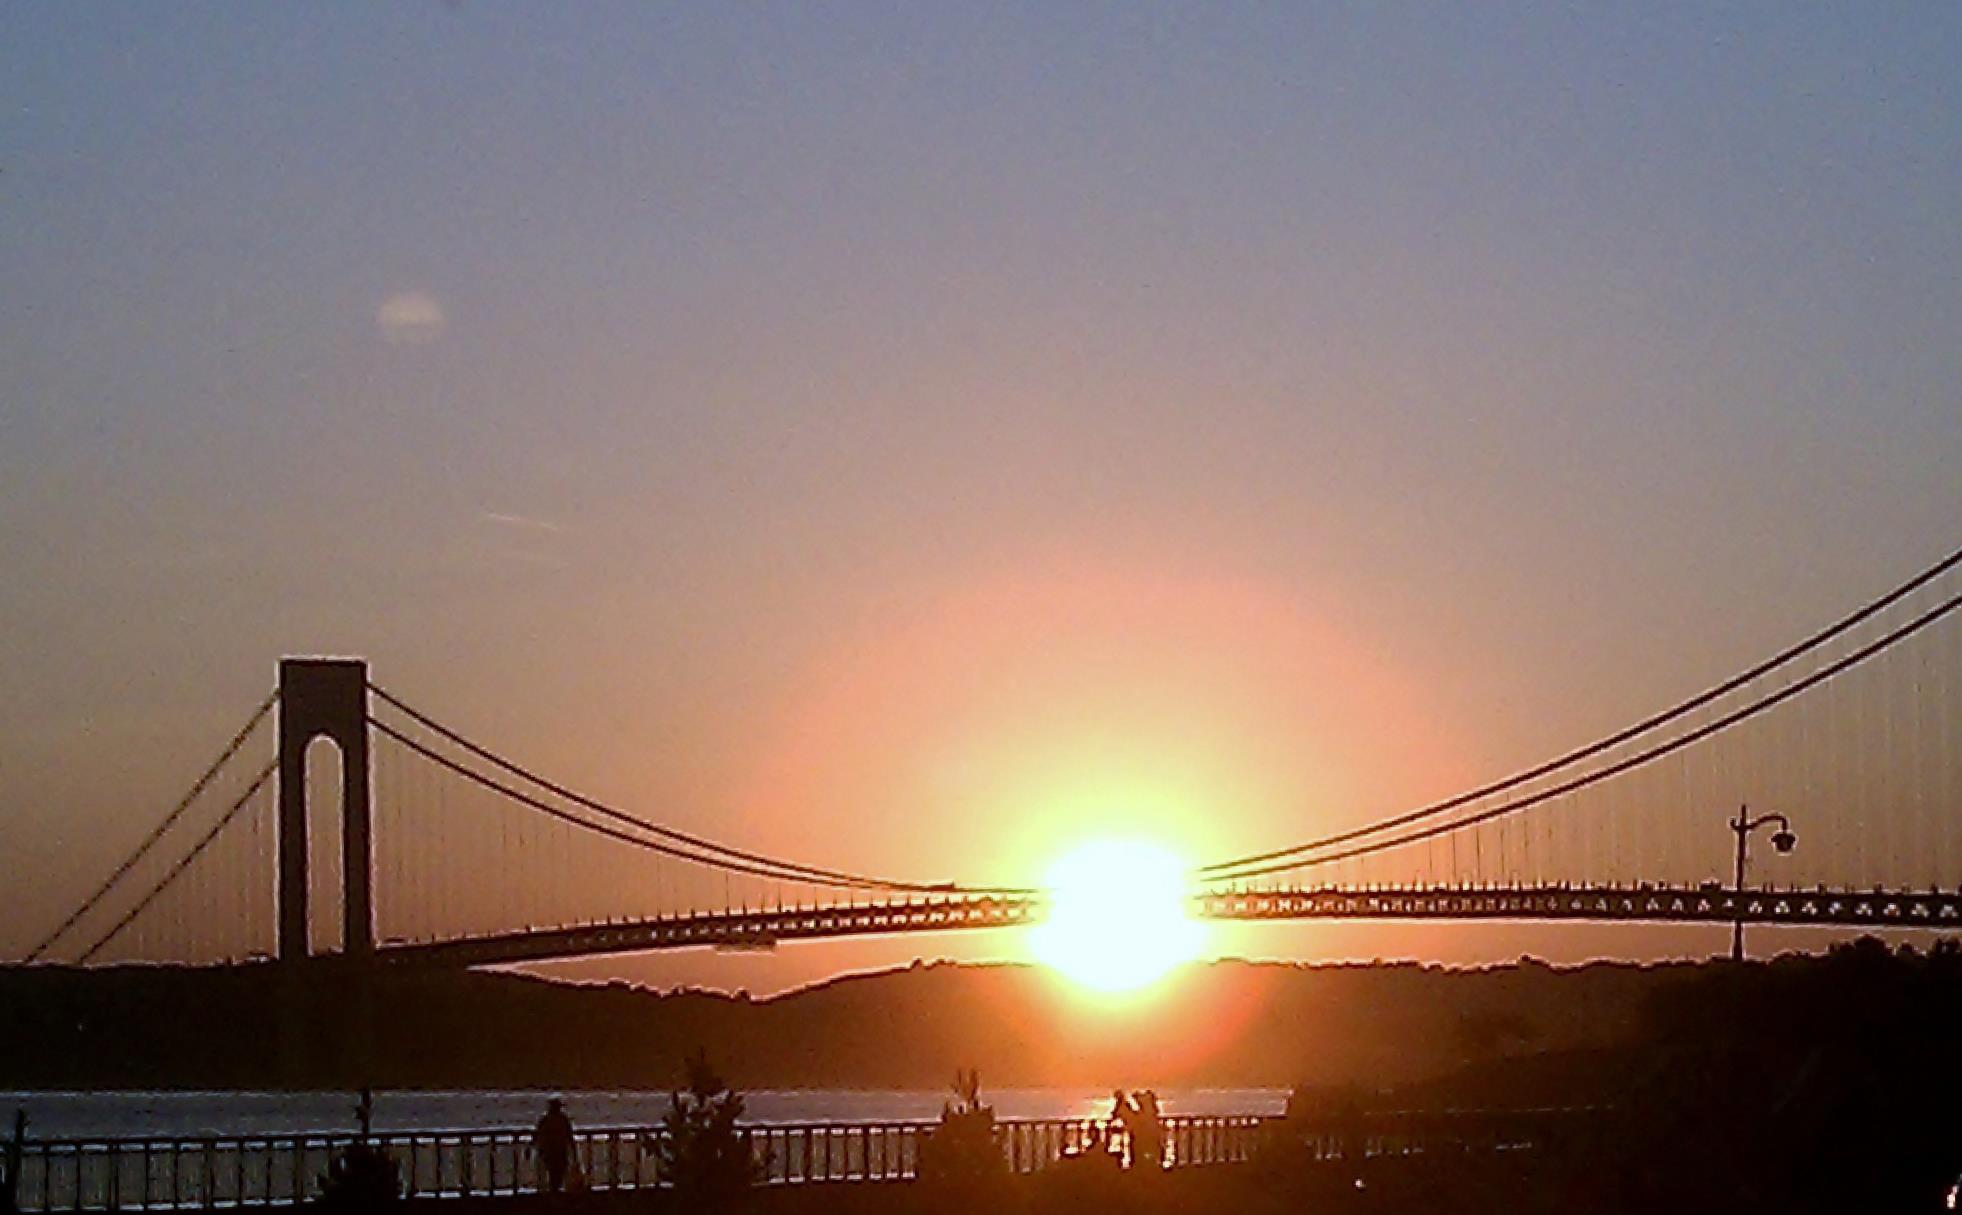 Observing: Pier i Summer on the Hudson